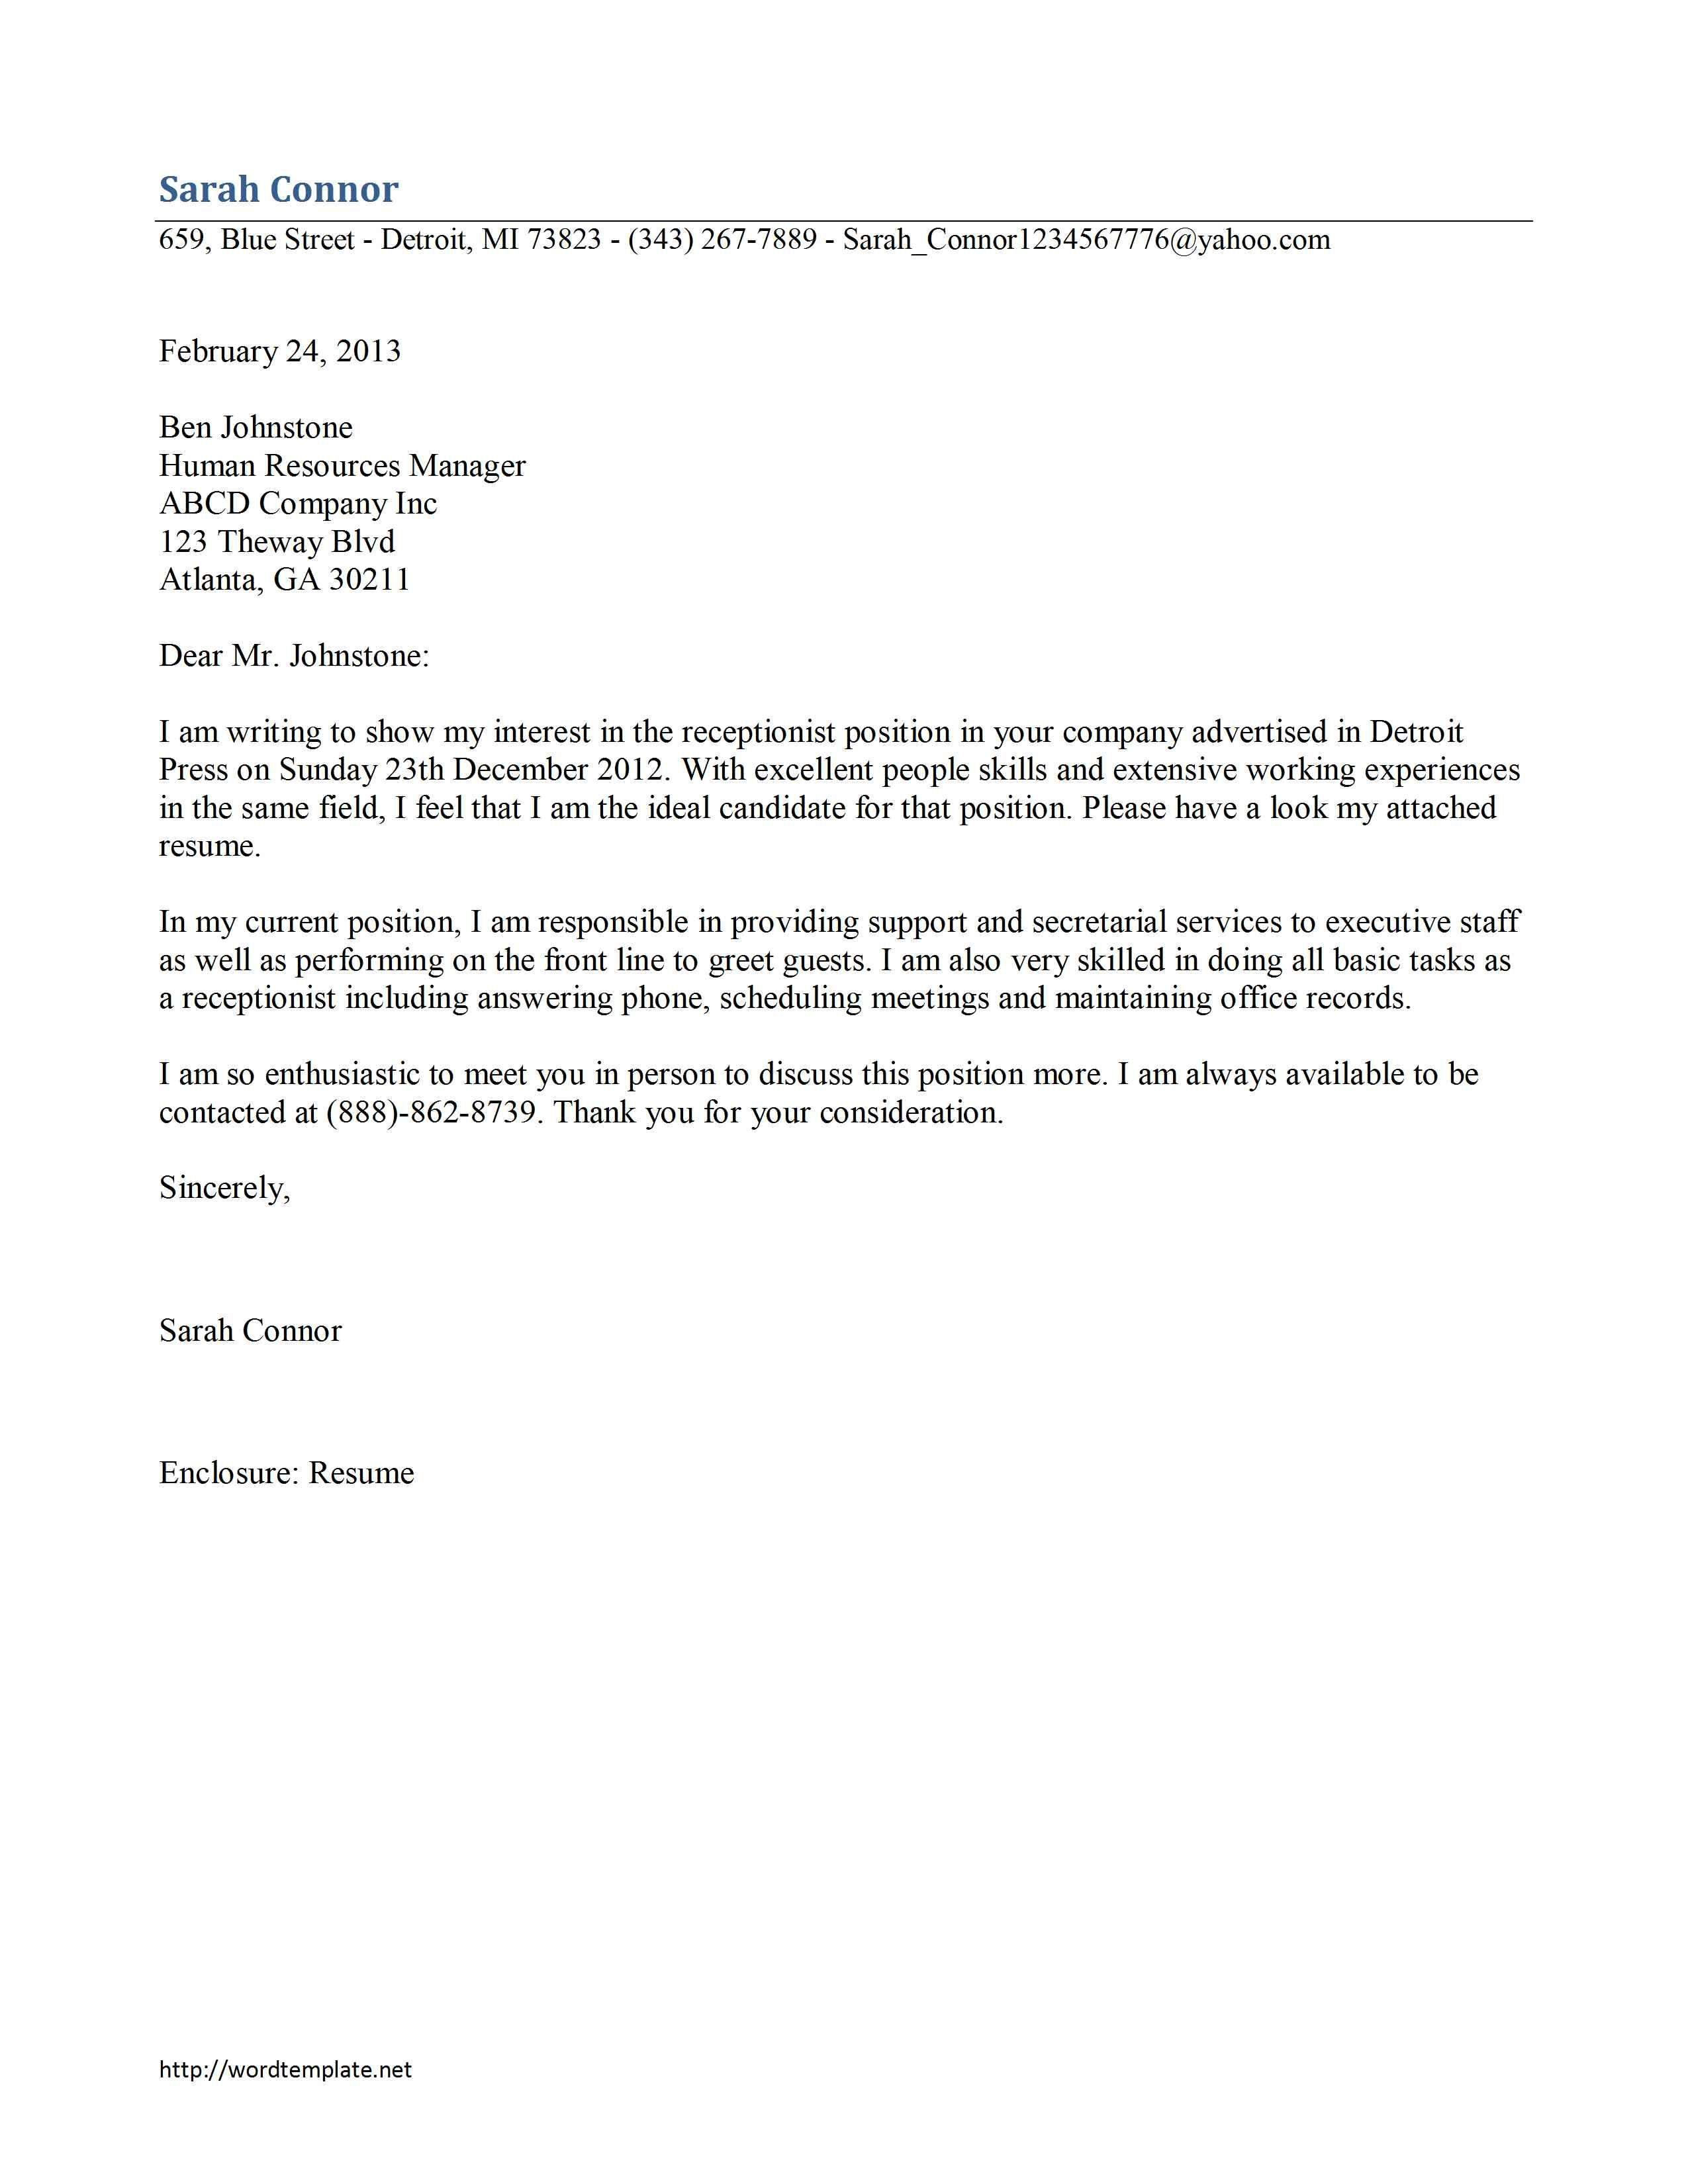 job application cover letter example australia